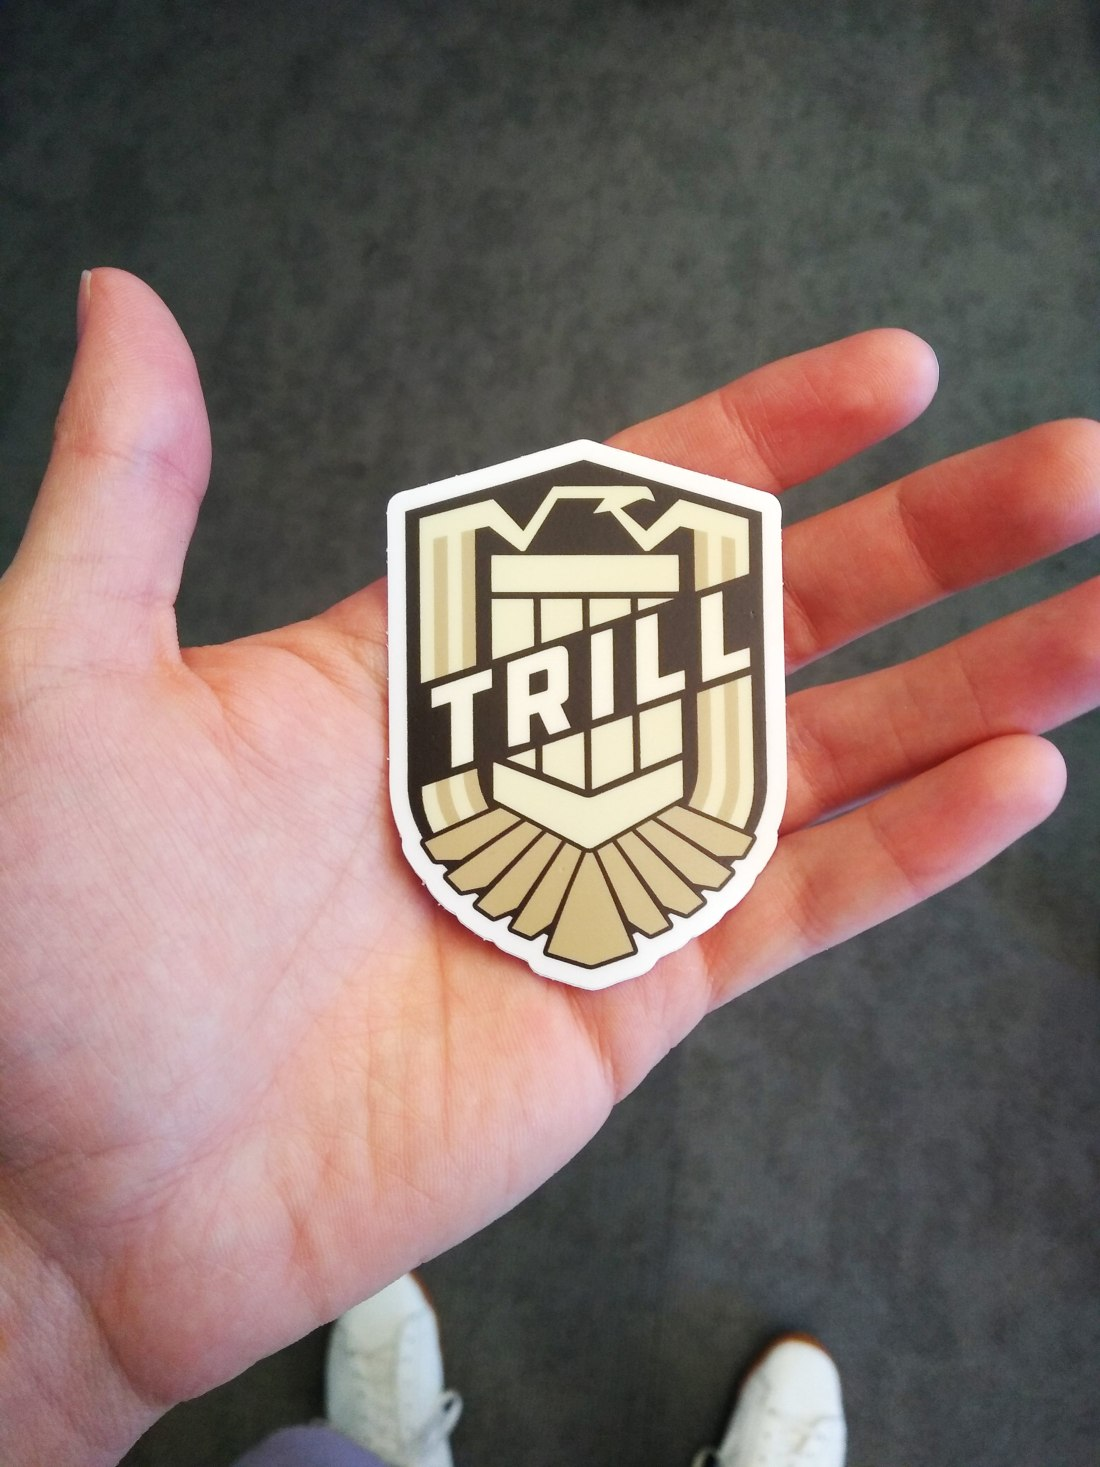 Team Sticker Design License to Trill